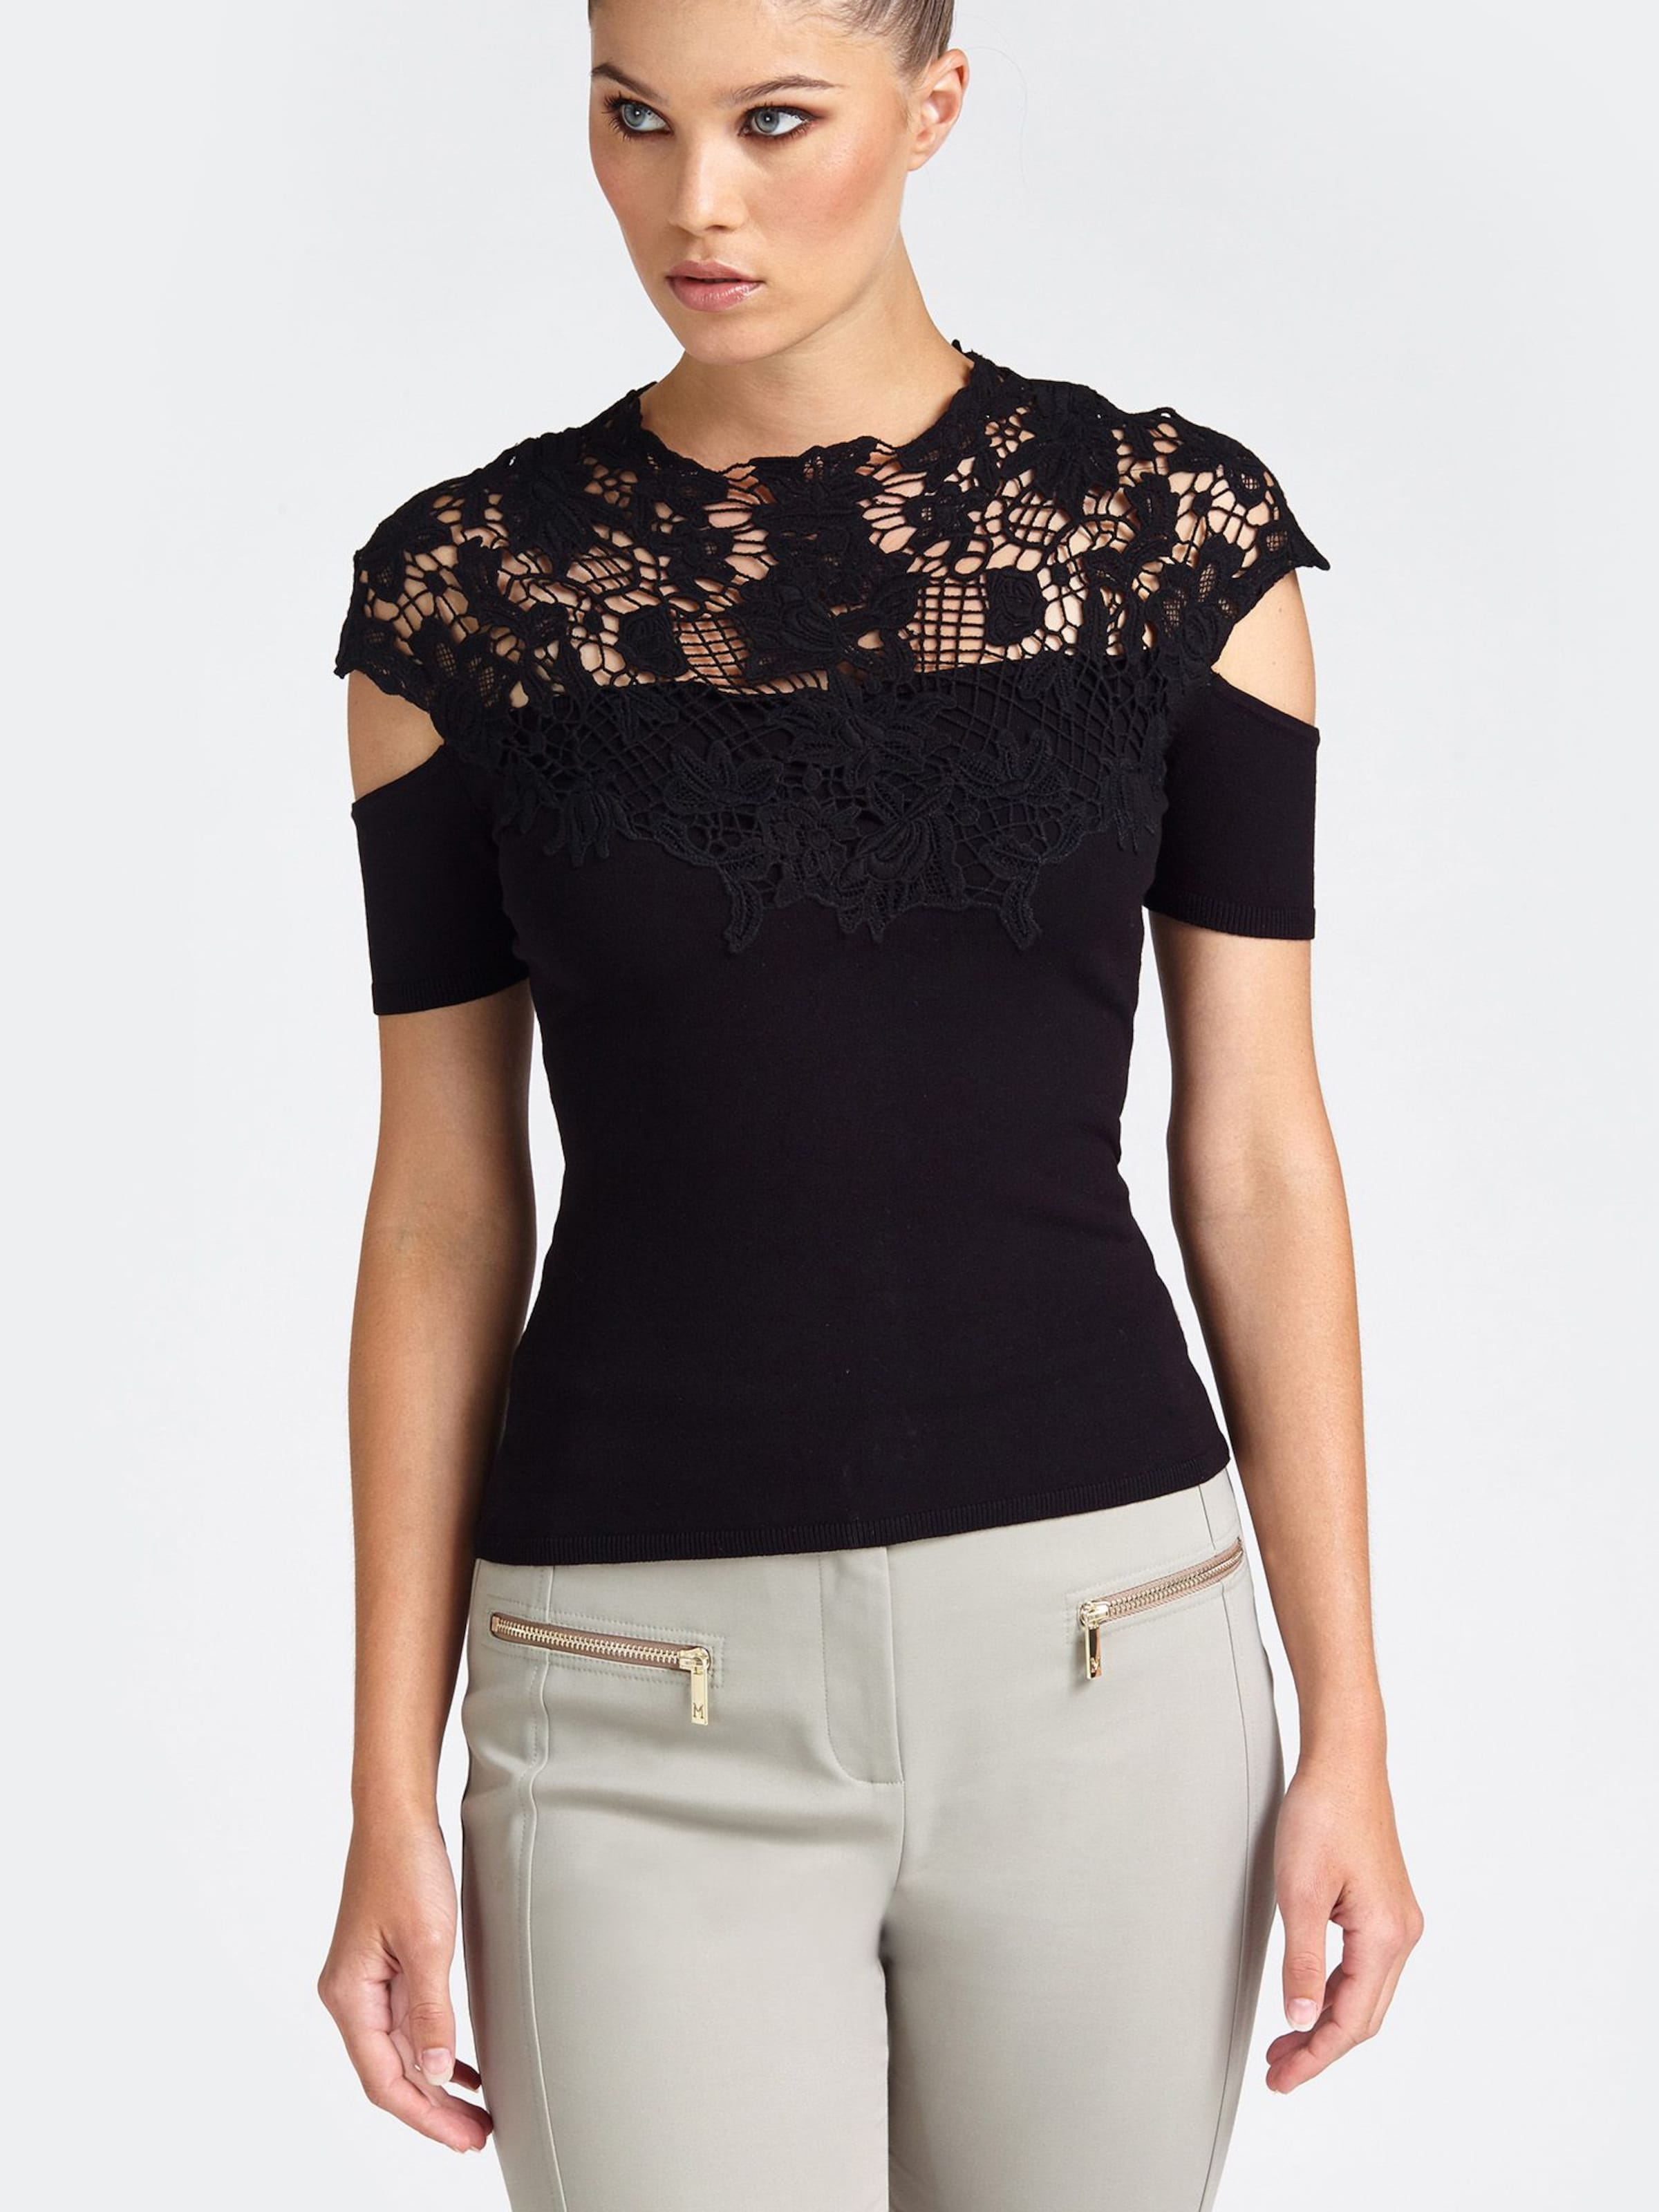 Shirt Angeles Los In Marciano Schwarz rCeBQdxoW